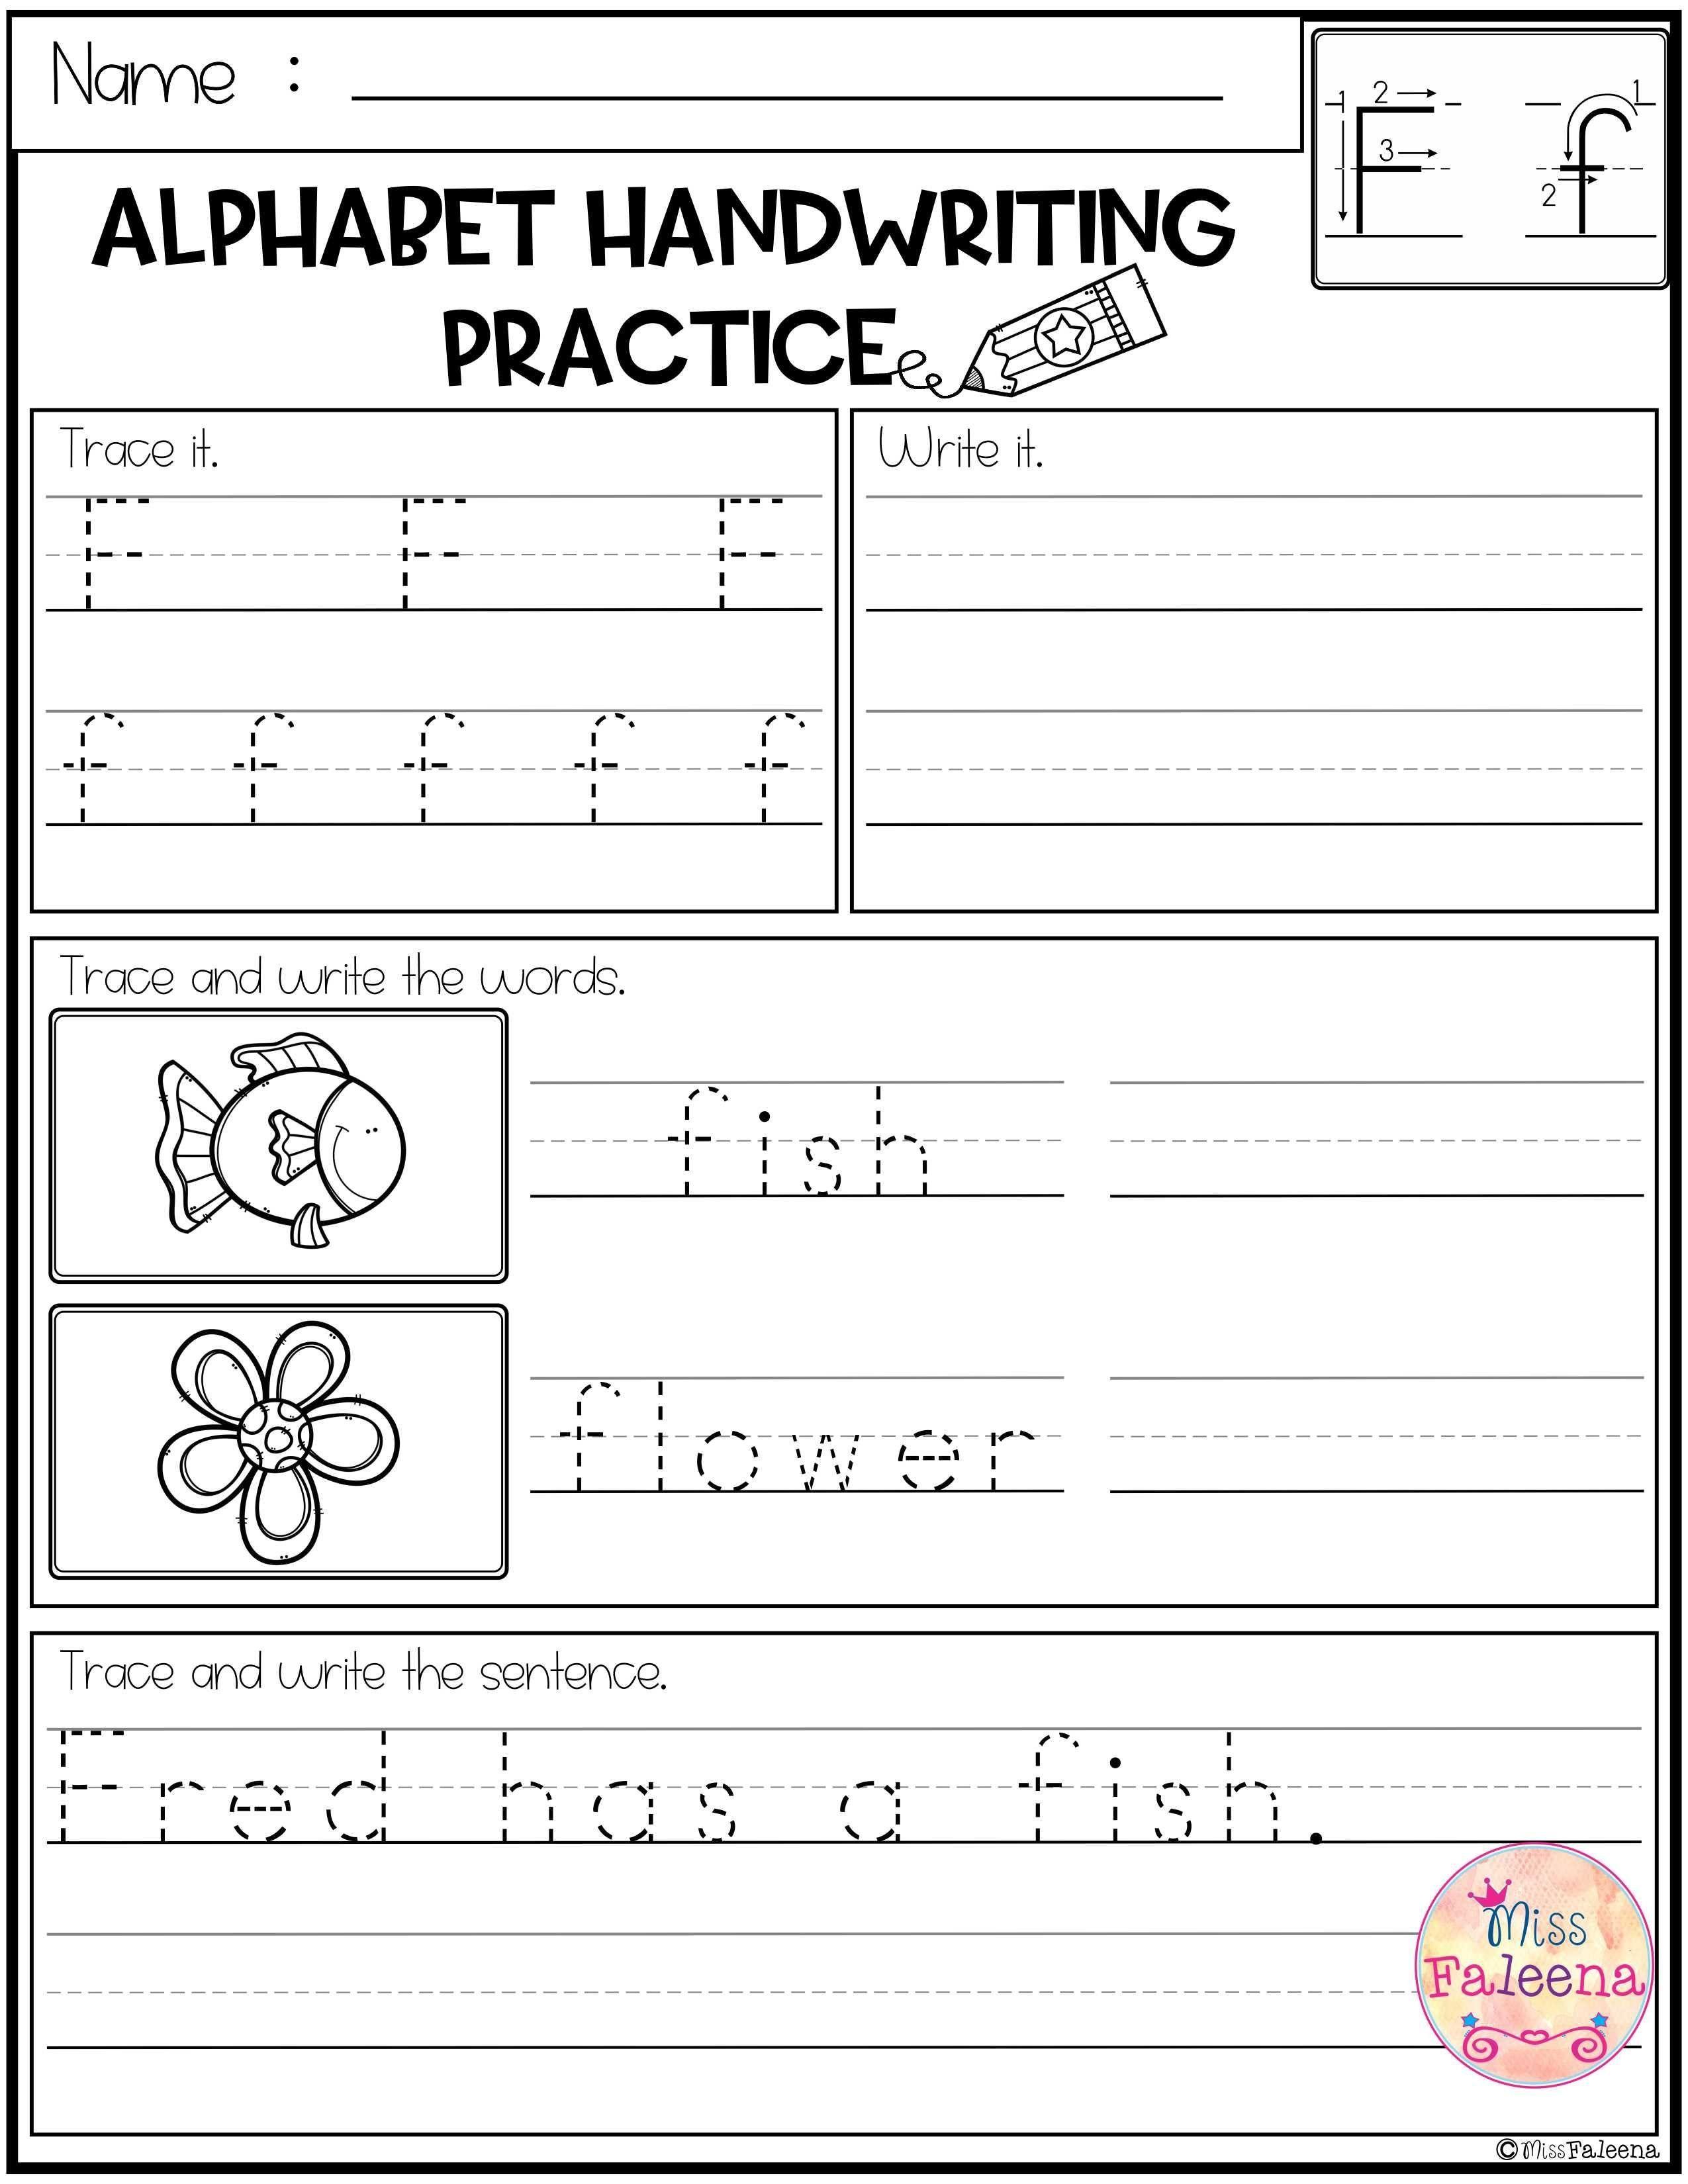 38 Free Alphabet Handwriting Worksheets In